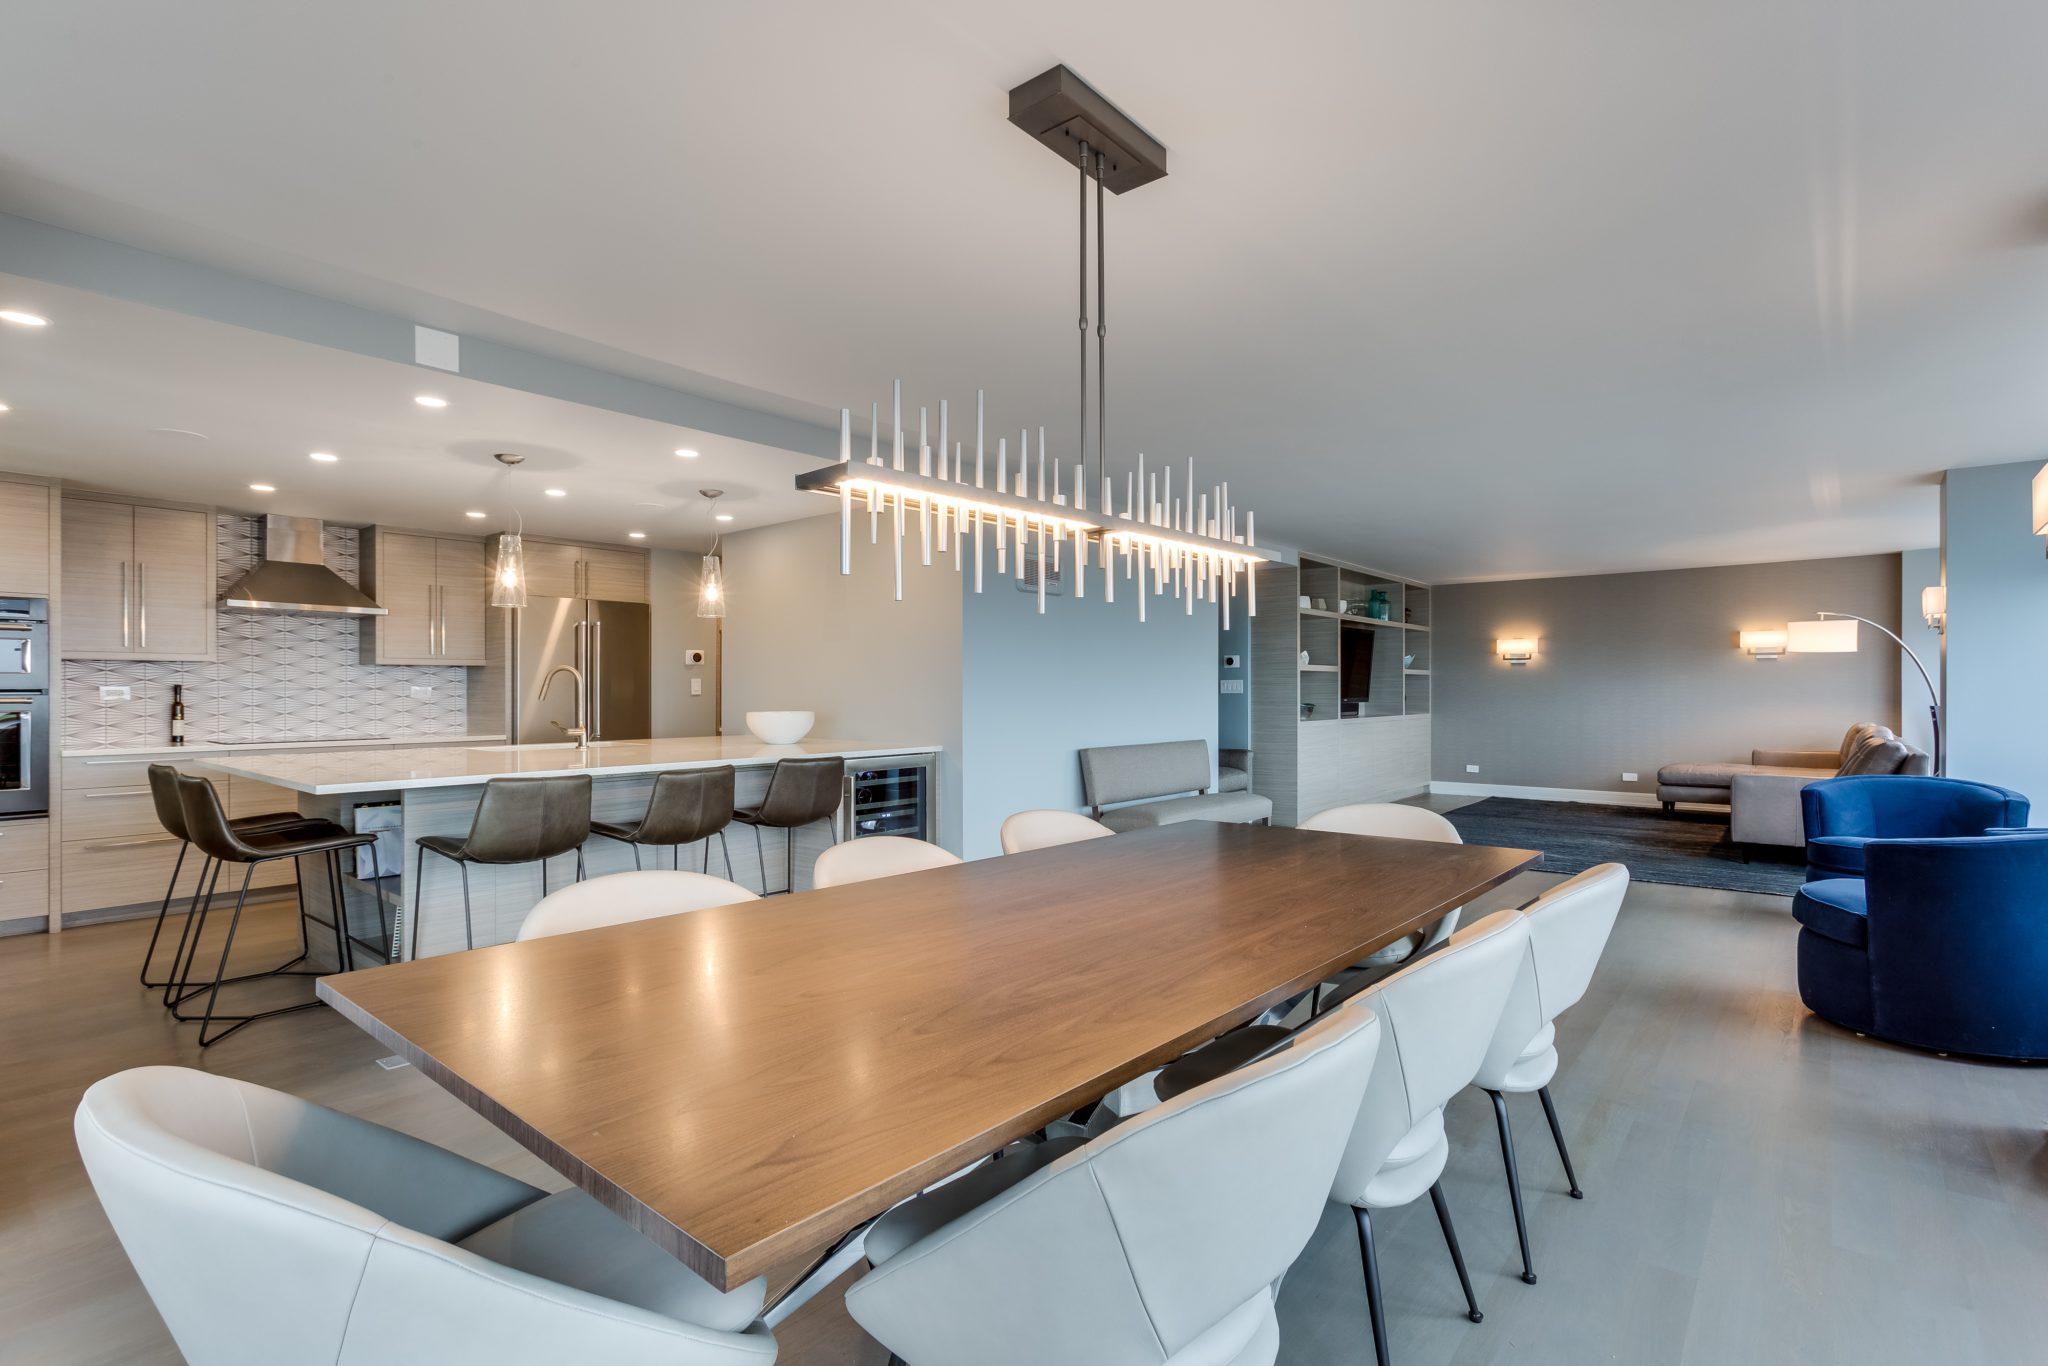 Modern Gold Coast condo with open floor plan by Rae Duncan Interior Design